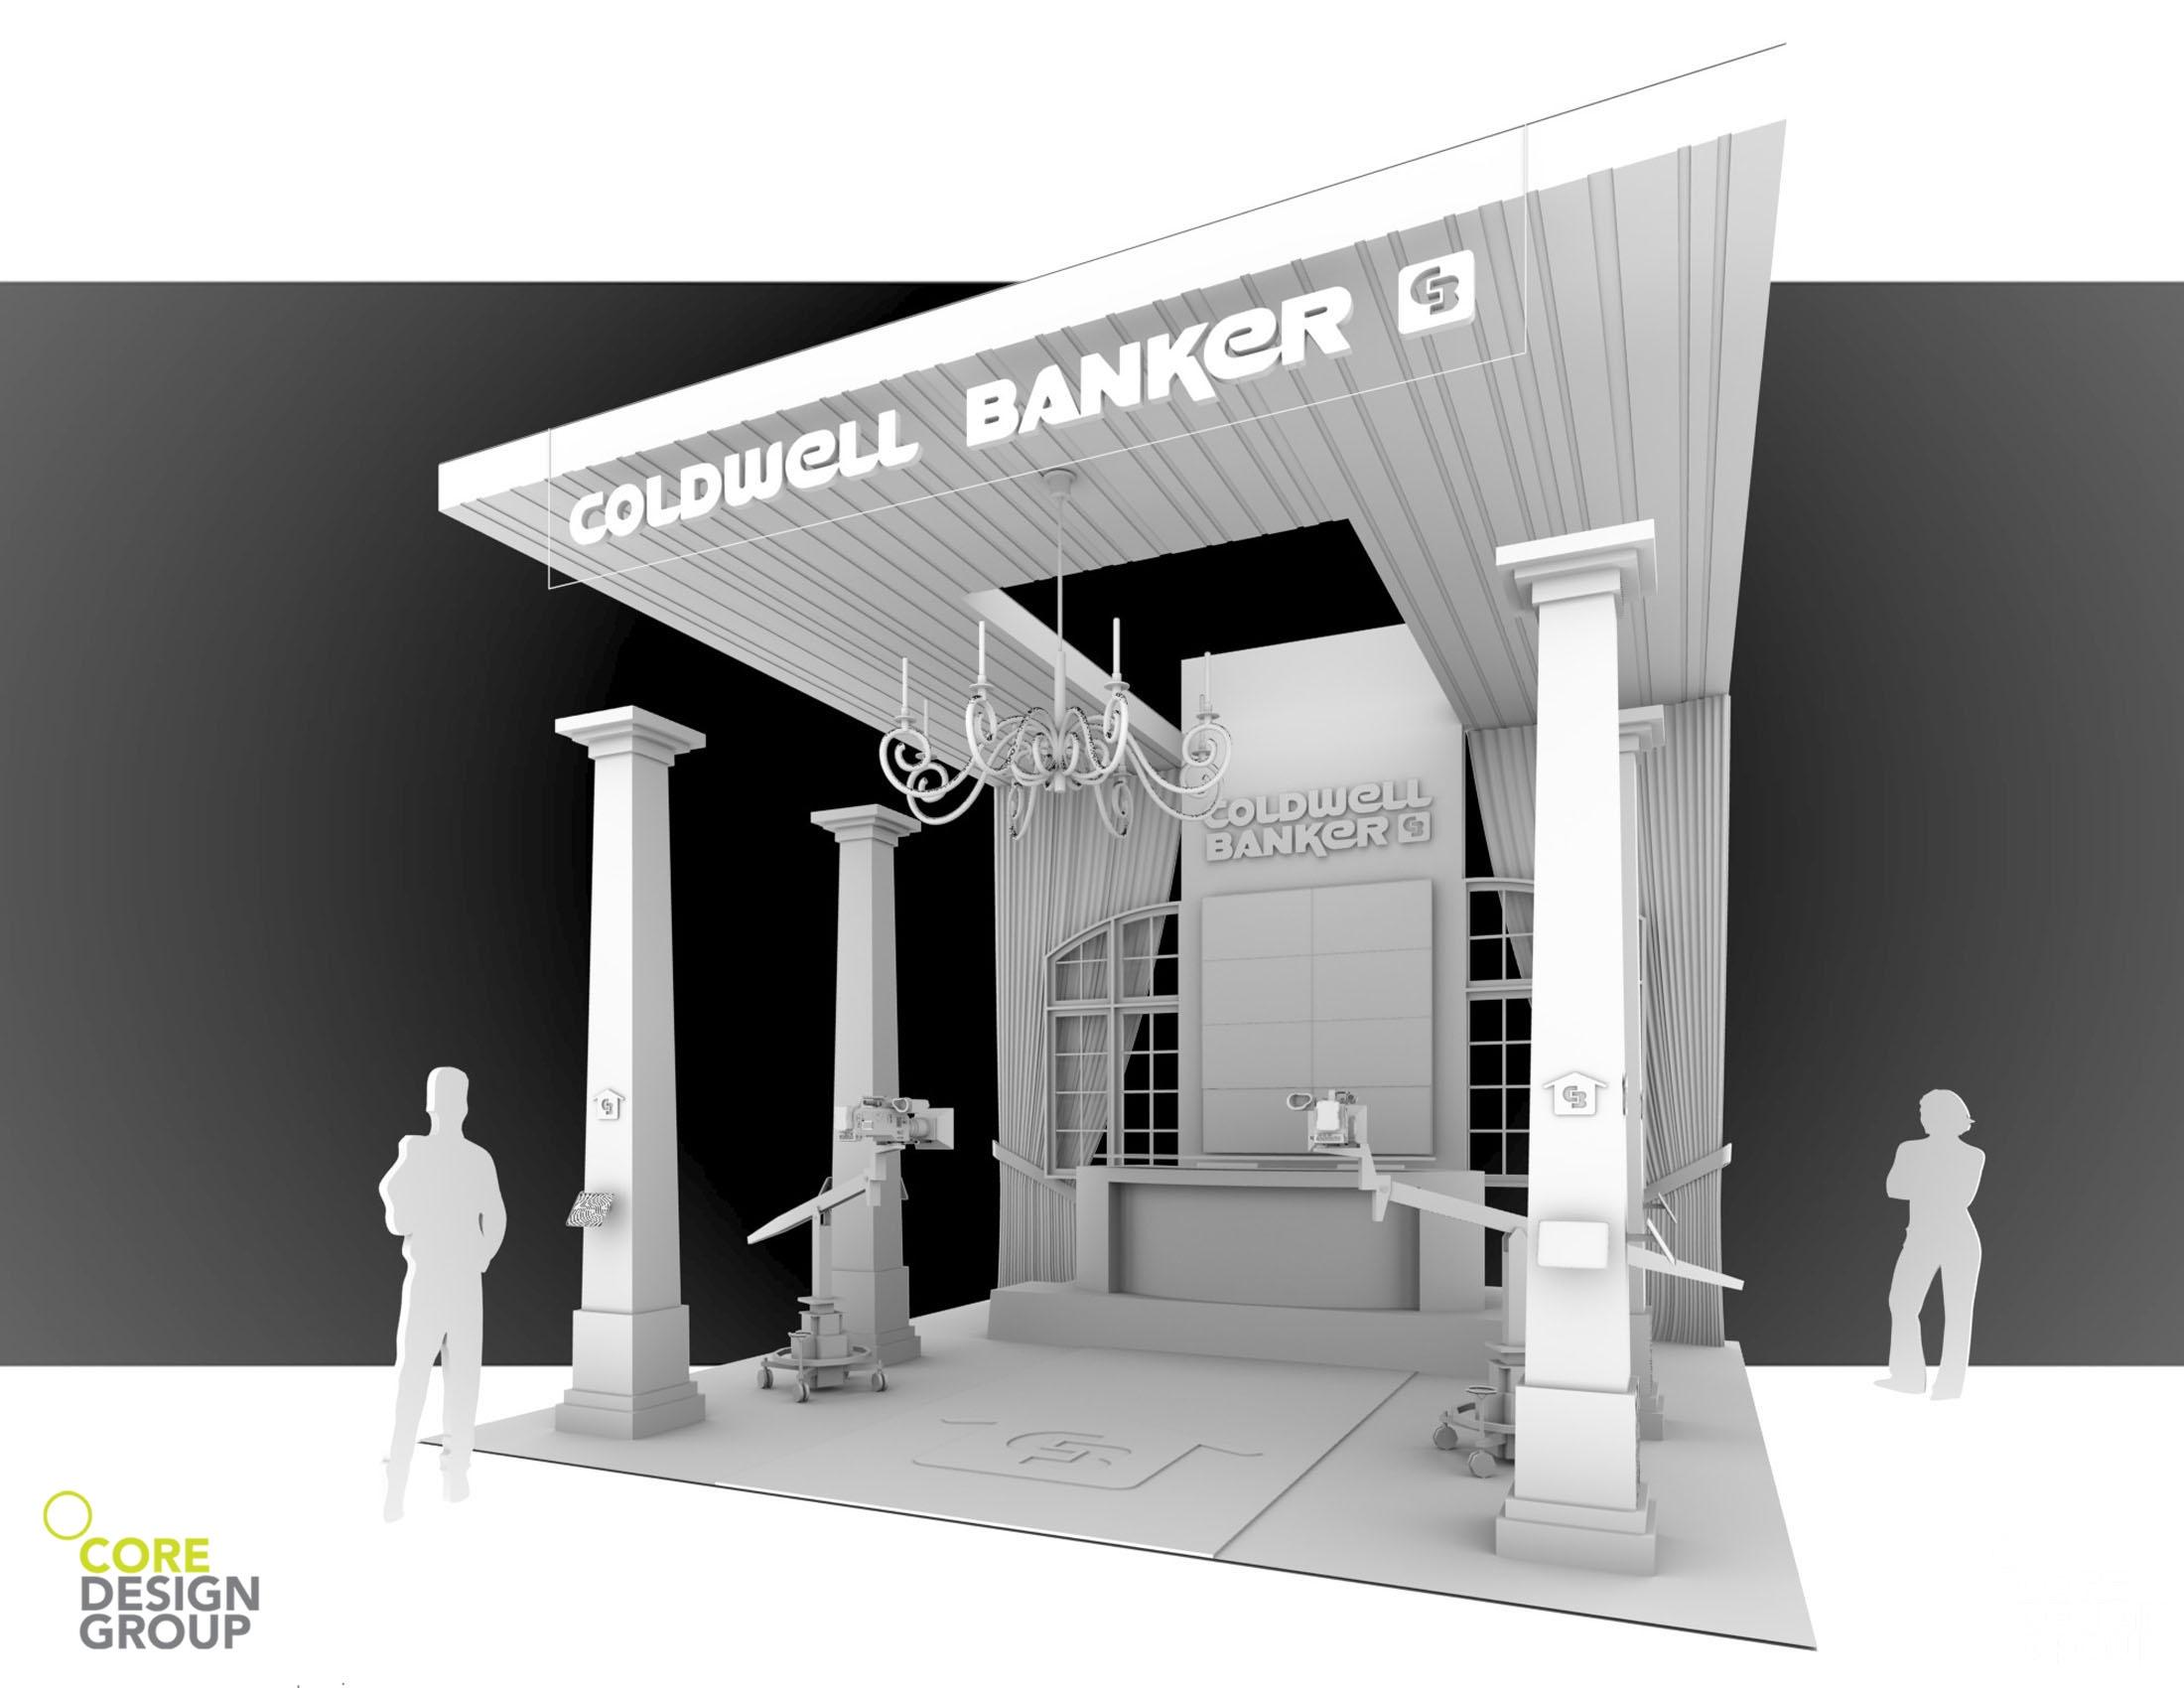 Freelance Exhibition Stand Design : Exhibits portfolio core design group freelance exhibit